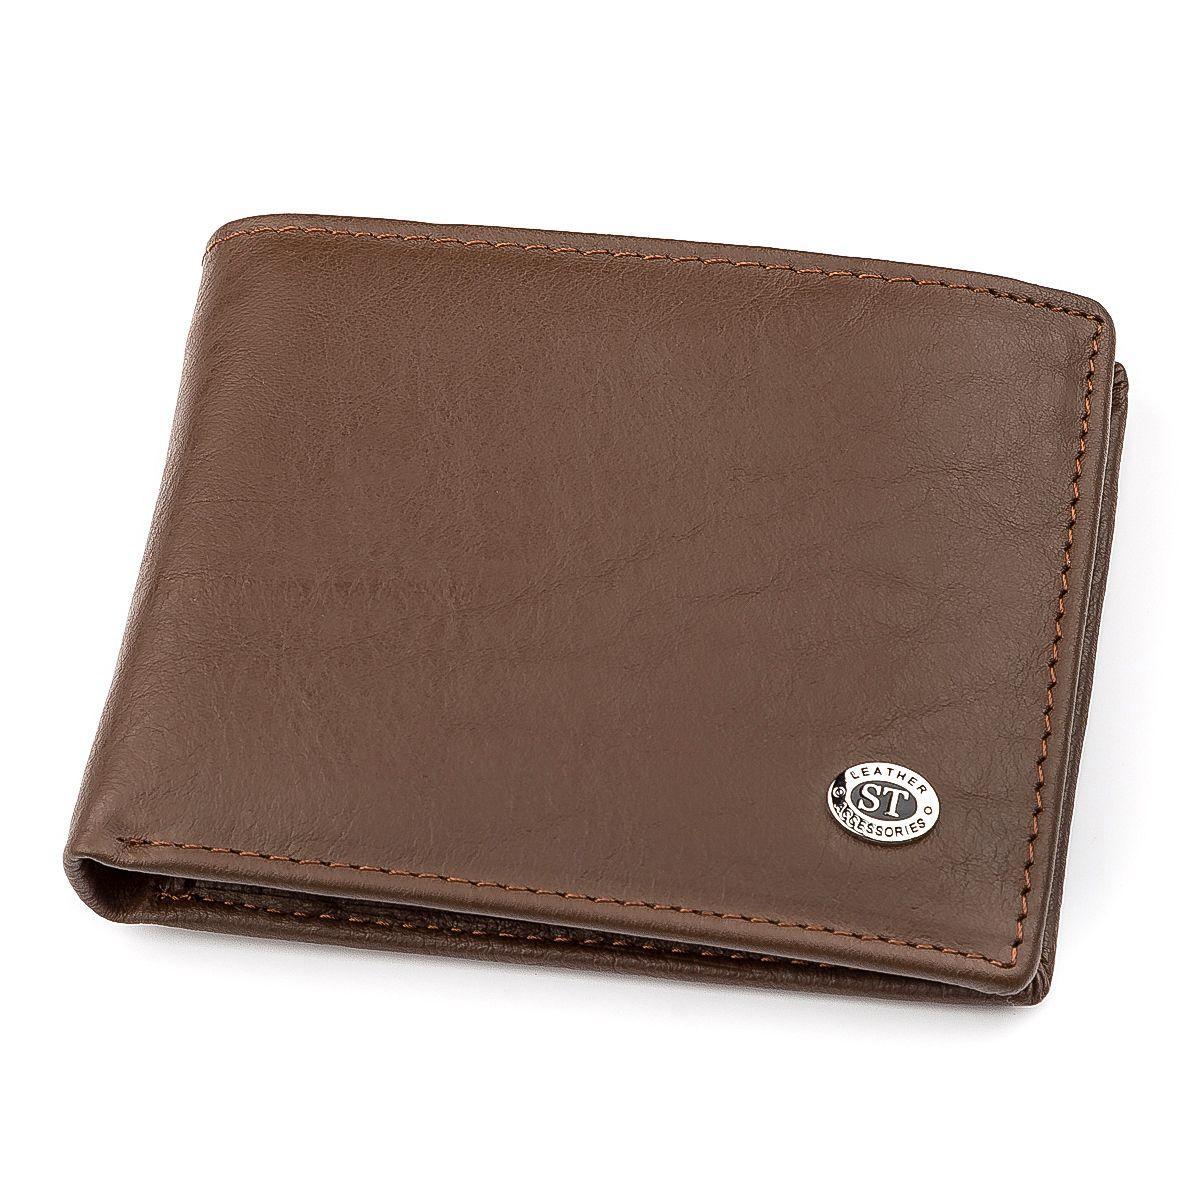 Мужской кошелек ST Leather 18353 (ST-1) НОВИНКА Коричневый